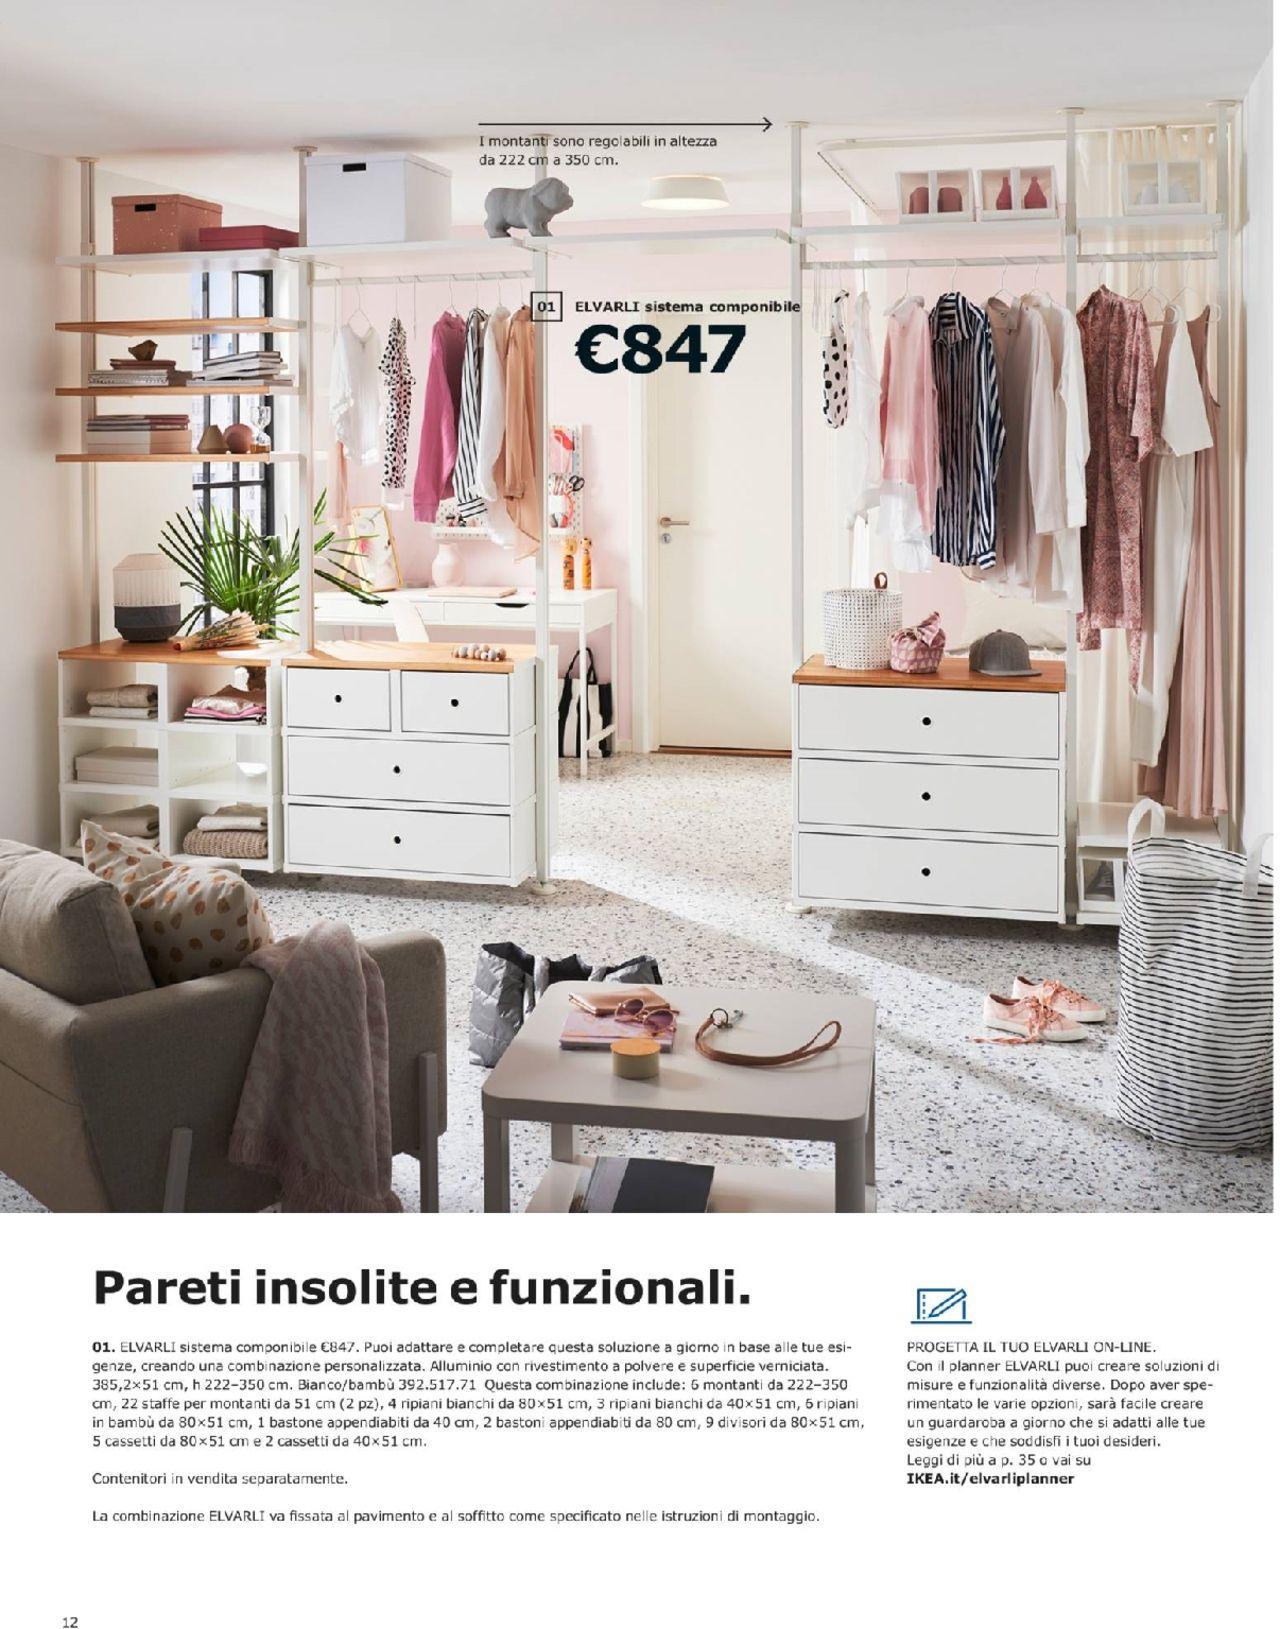 Ikea Catalogo Armadio Guardaroba.Leaflet Ikea Guardaroba Ikea Pagina 12 Valido Da 19 09 2018